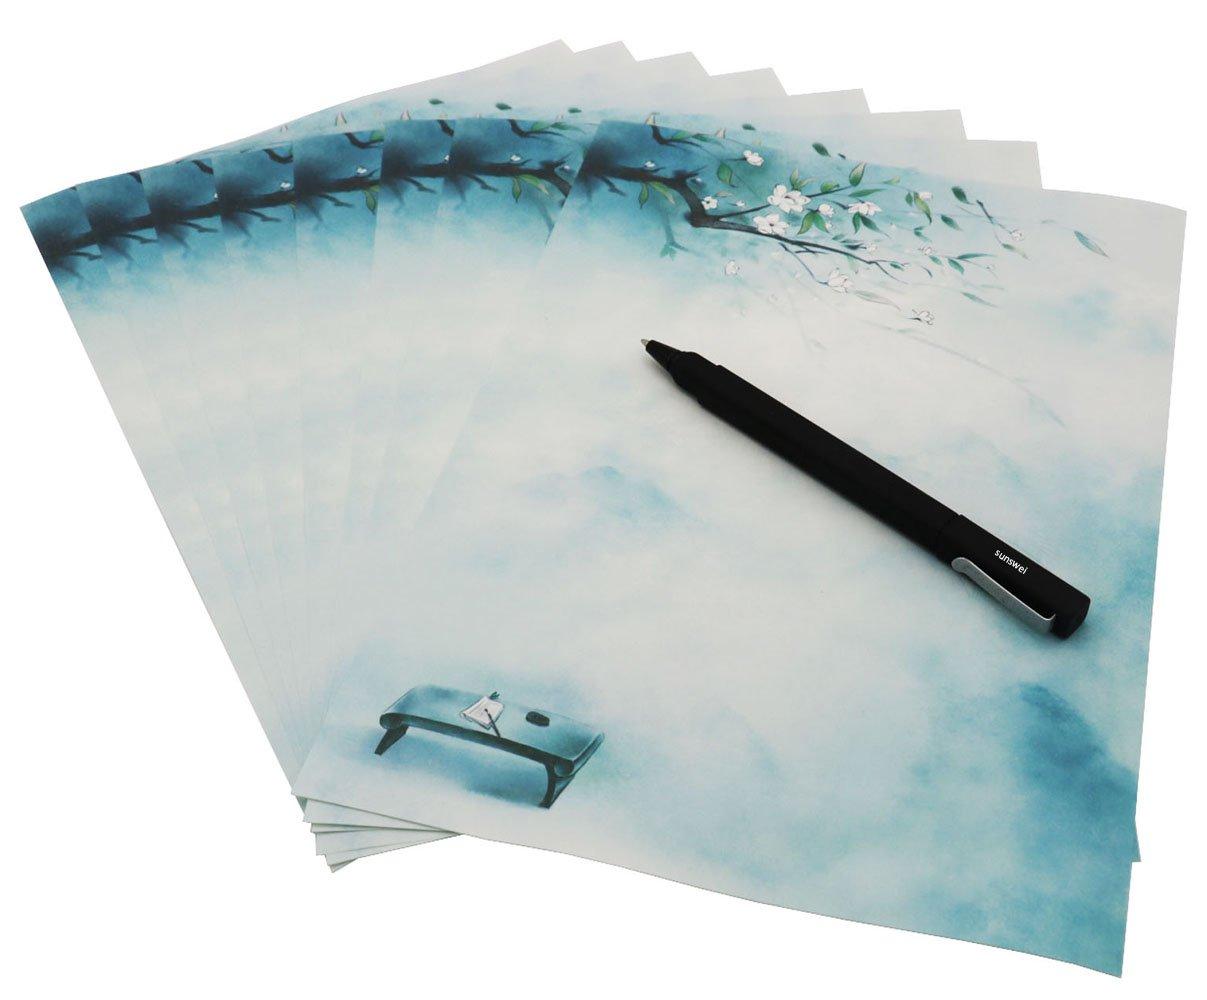 32/pezzi colori assortiti lettera e 16/pz buste Sunswei writing Stationary set carta carta da lettera Letter set